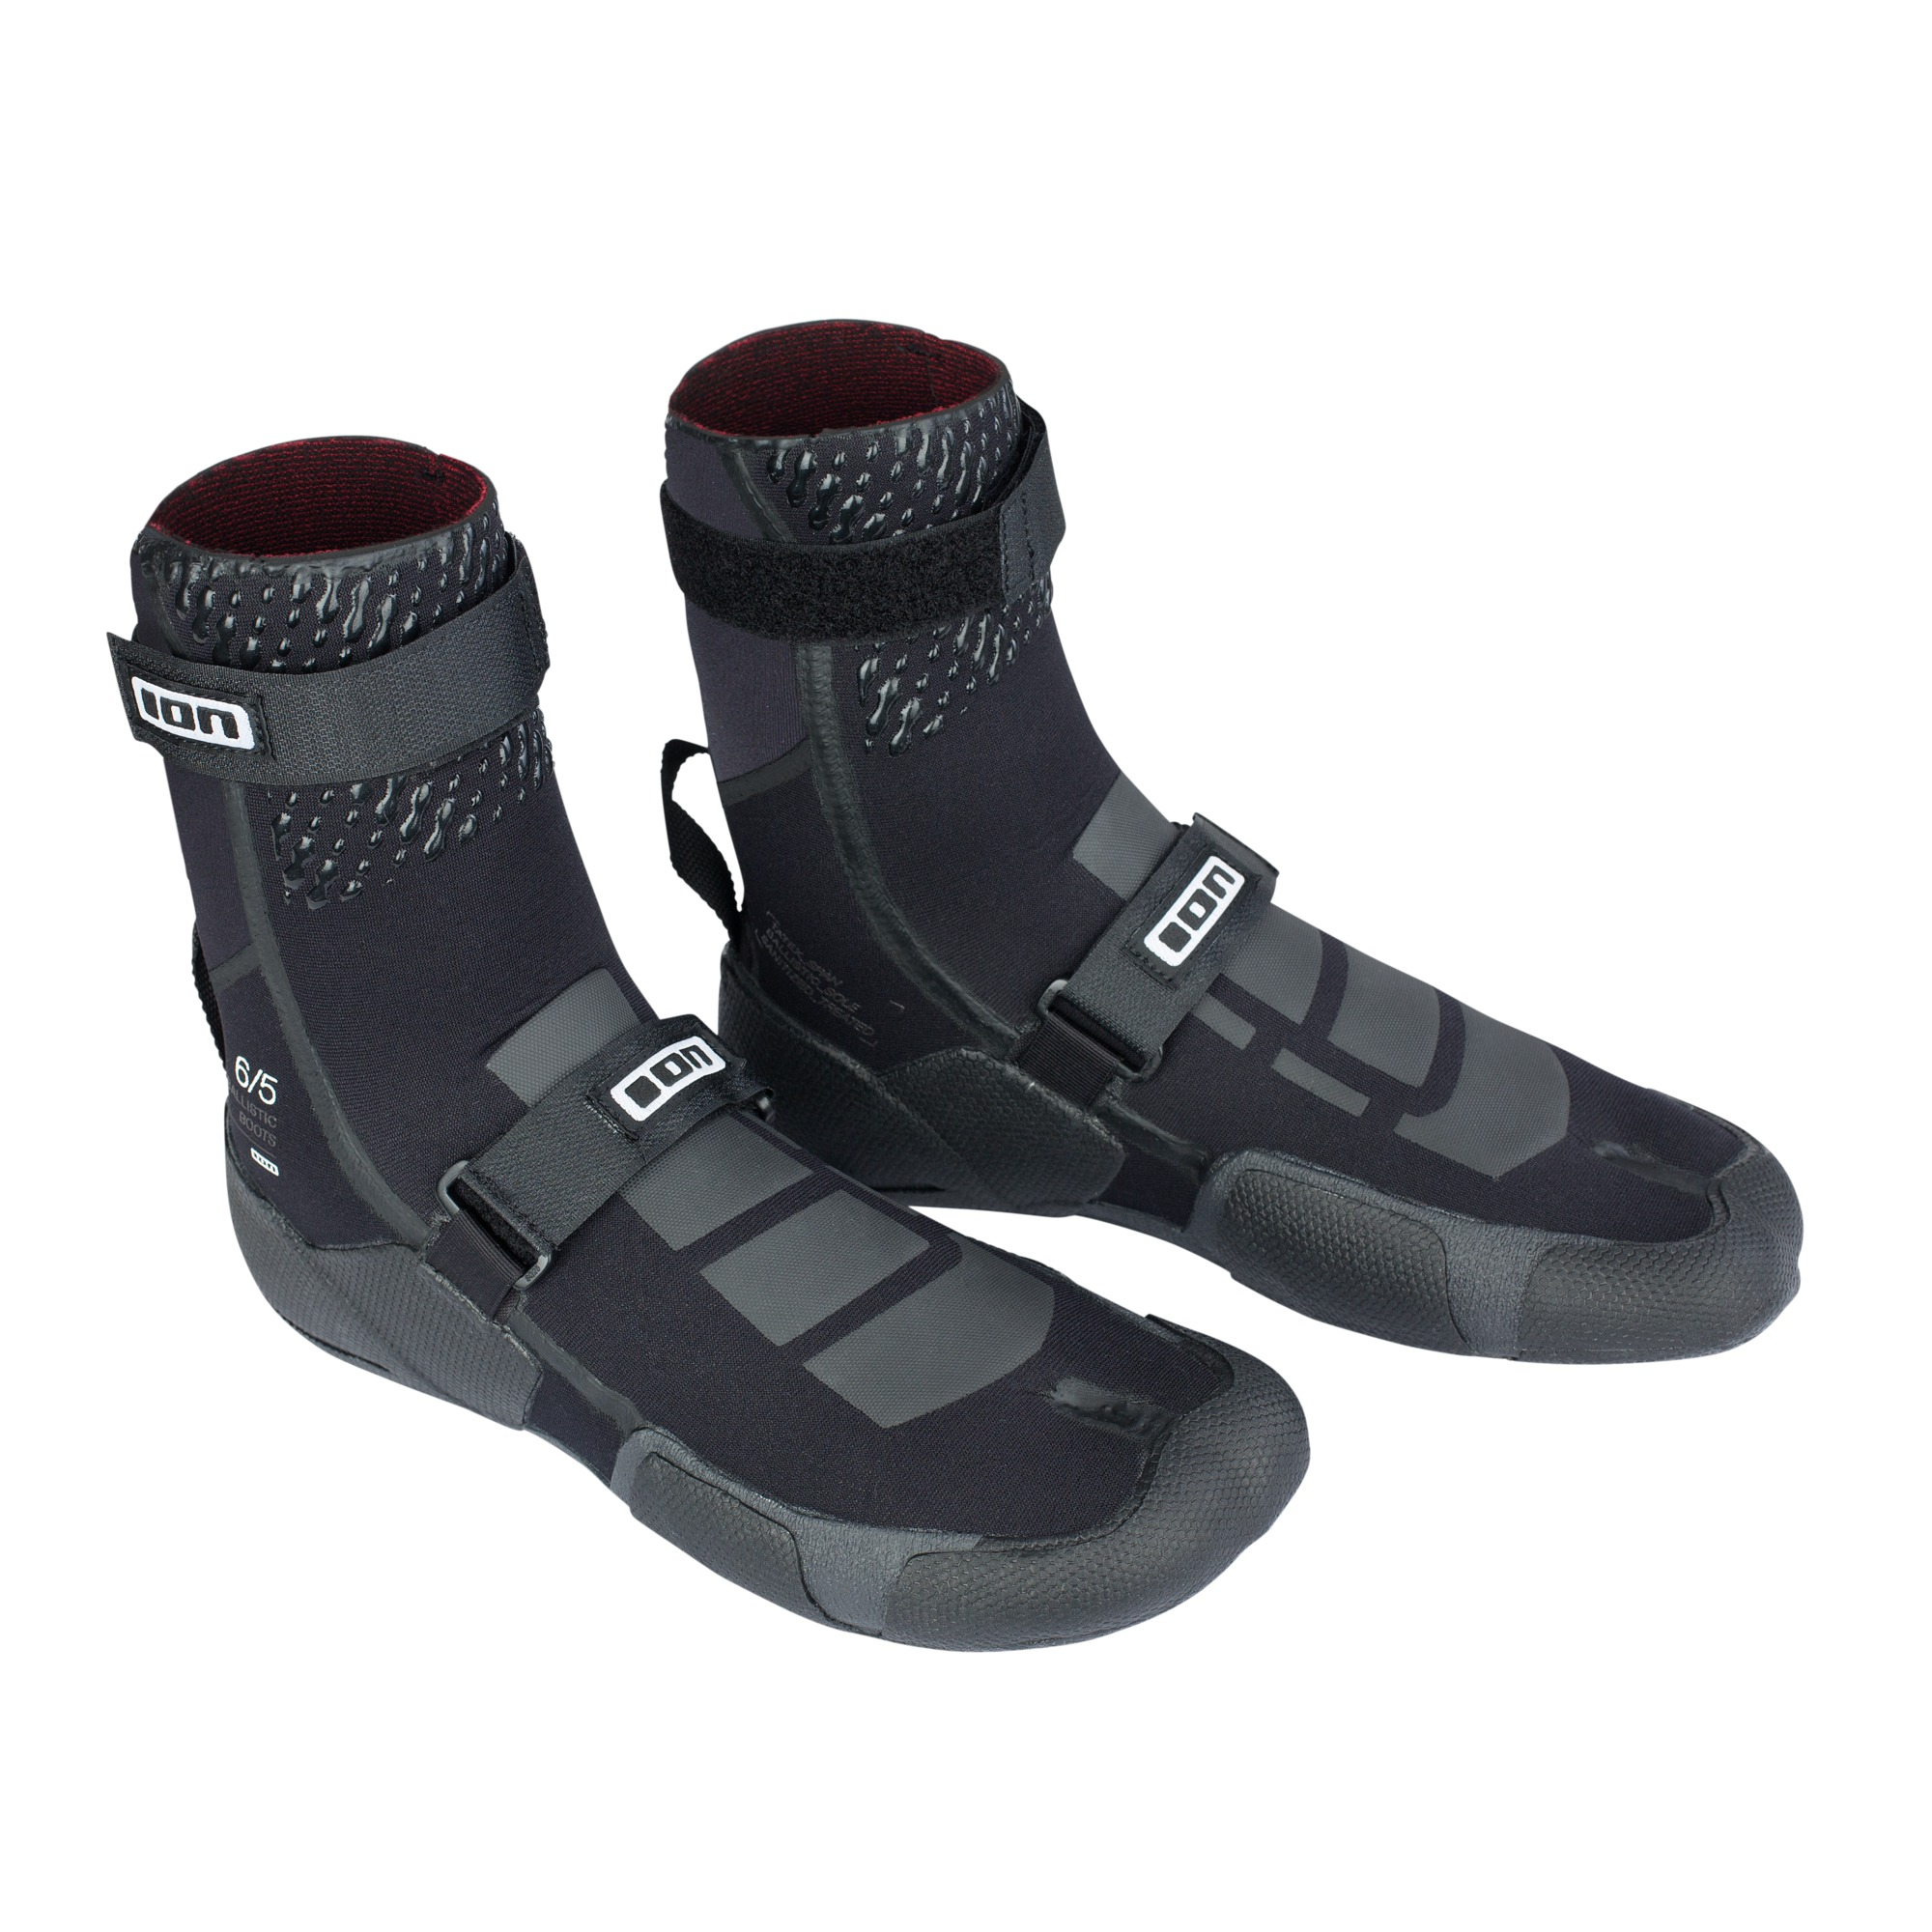 1455996f15 ION Ballistic Boots 6 5 - Puravida Board Riders